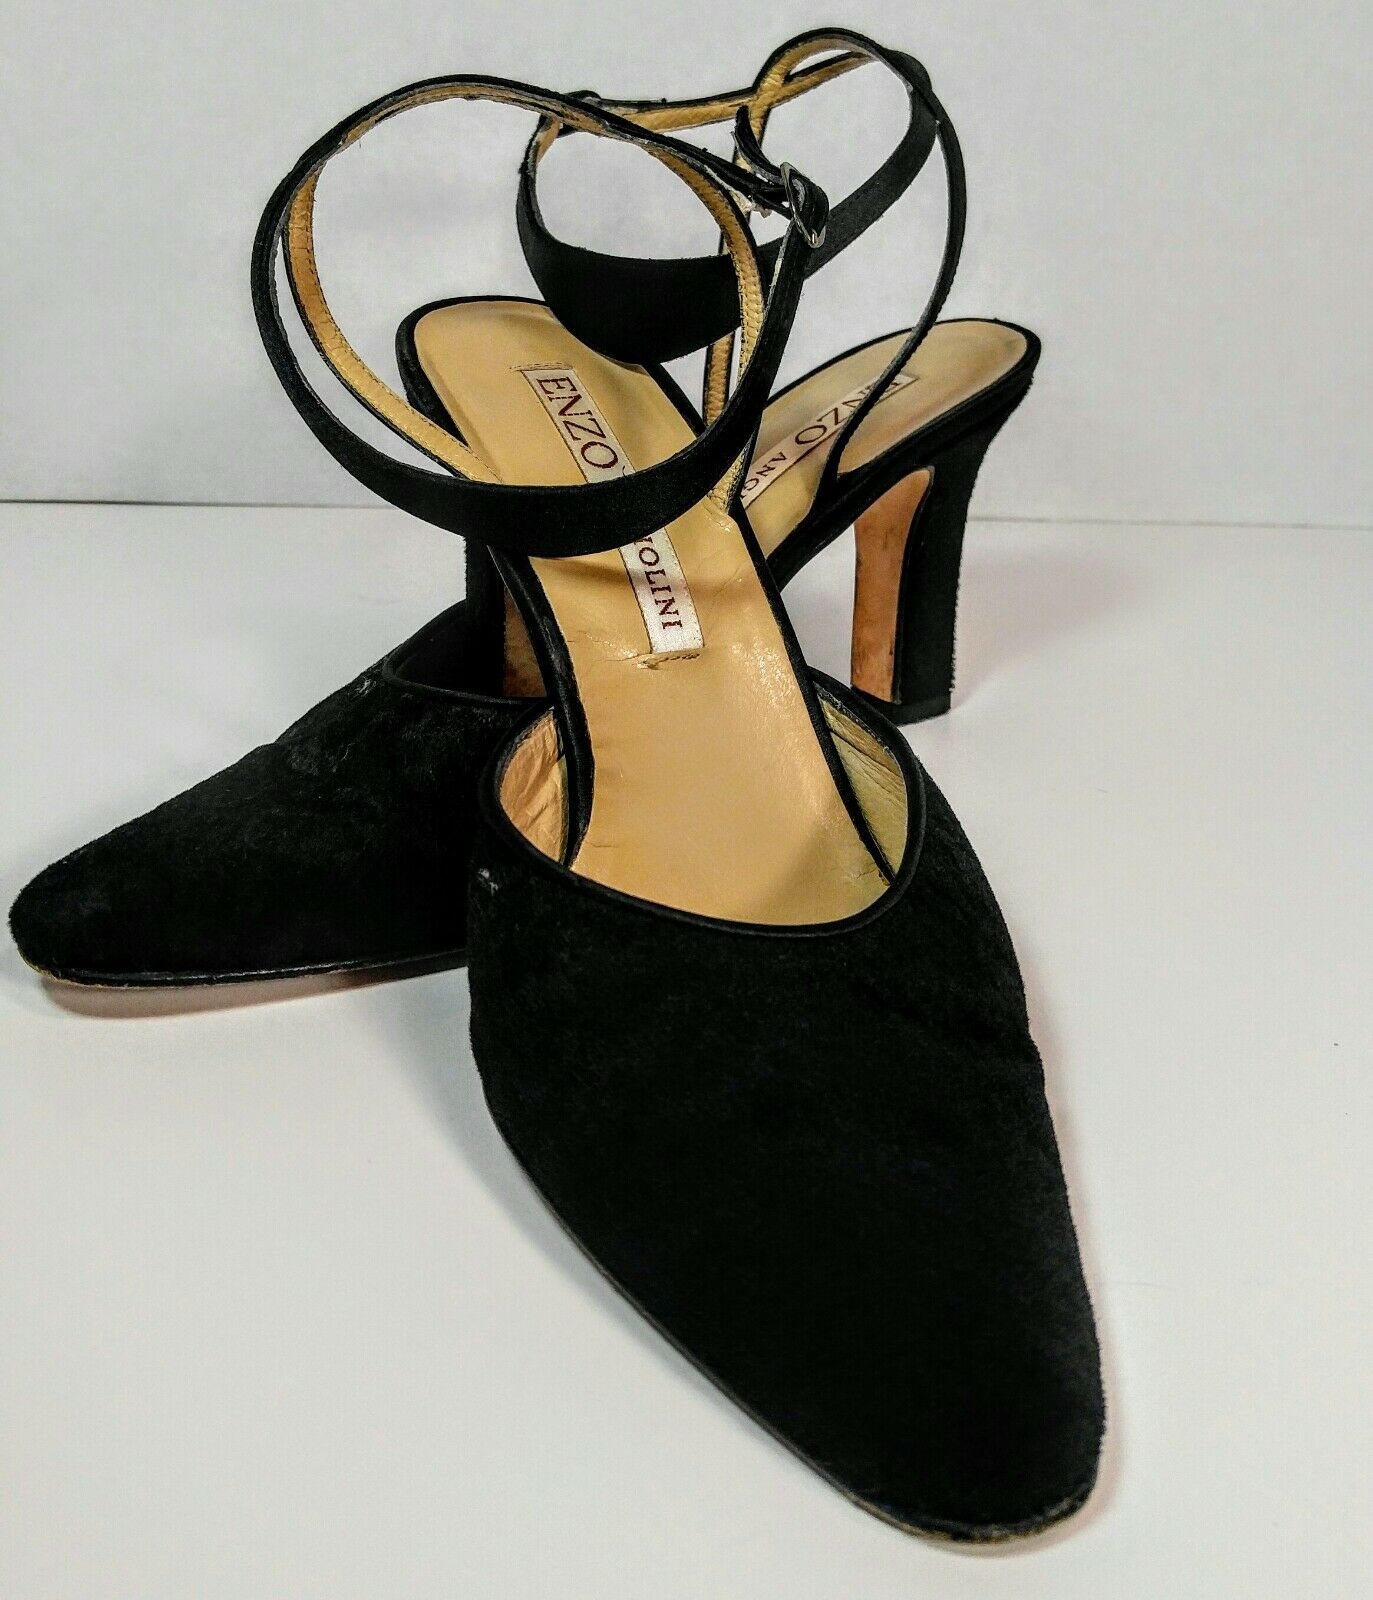 Enzo Angiolini Black Pumps Velvet Ankle Strap Pumps Black Size 8.5 f27172